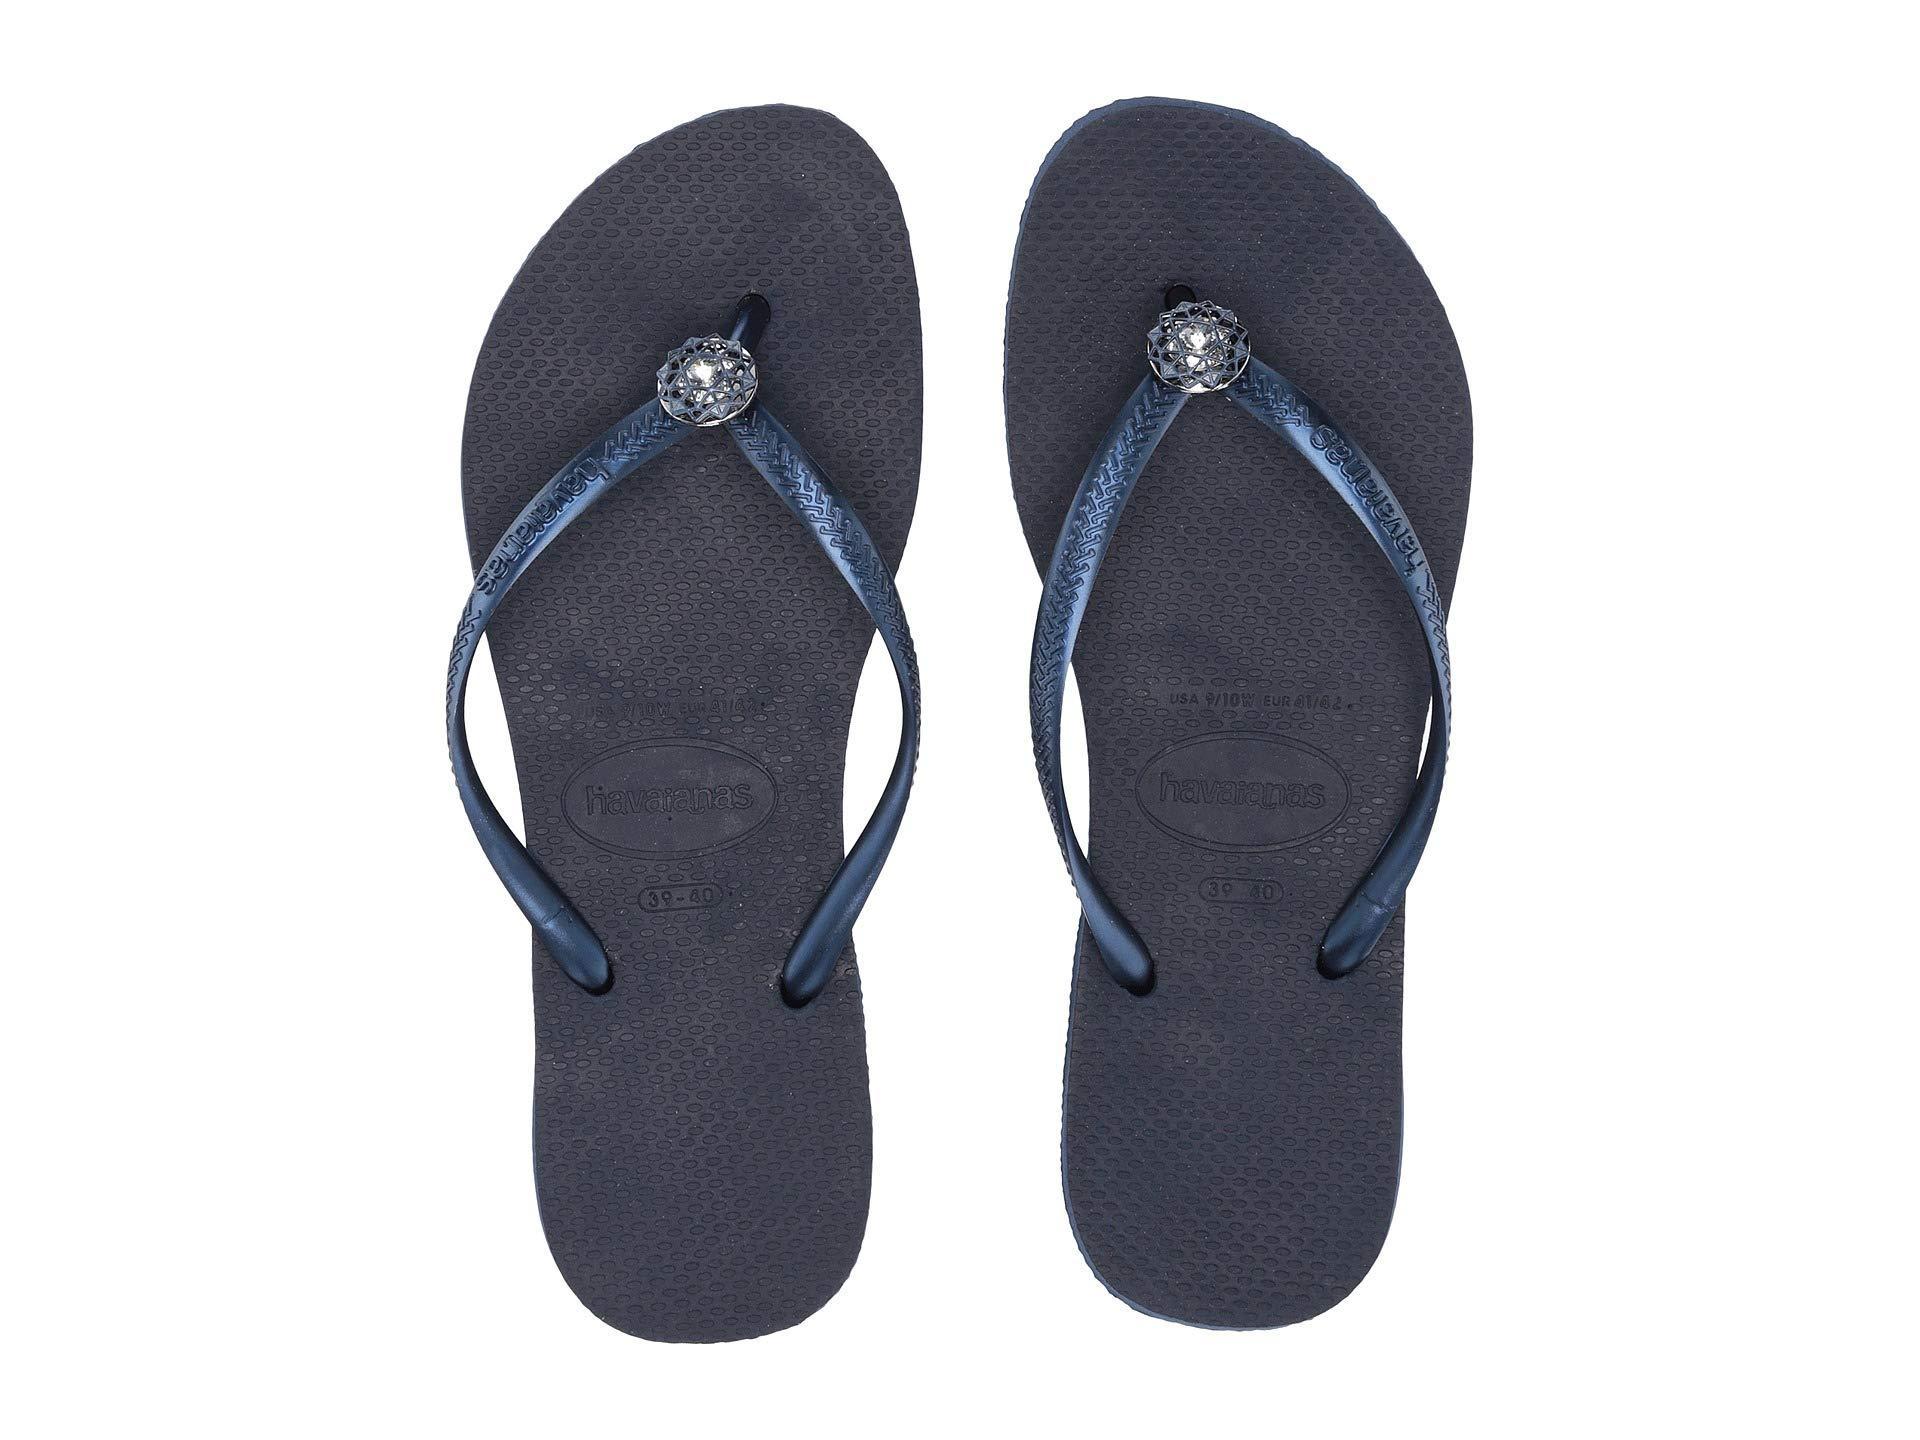 d9f8b0ba5 Havaianas - Slim Crystal Poem Flip Flops (navy Blue 1) Women s Sandals -  Lyst. View fullscreen